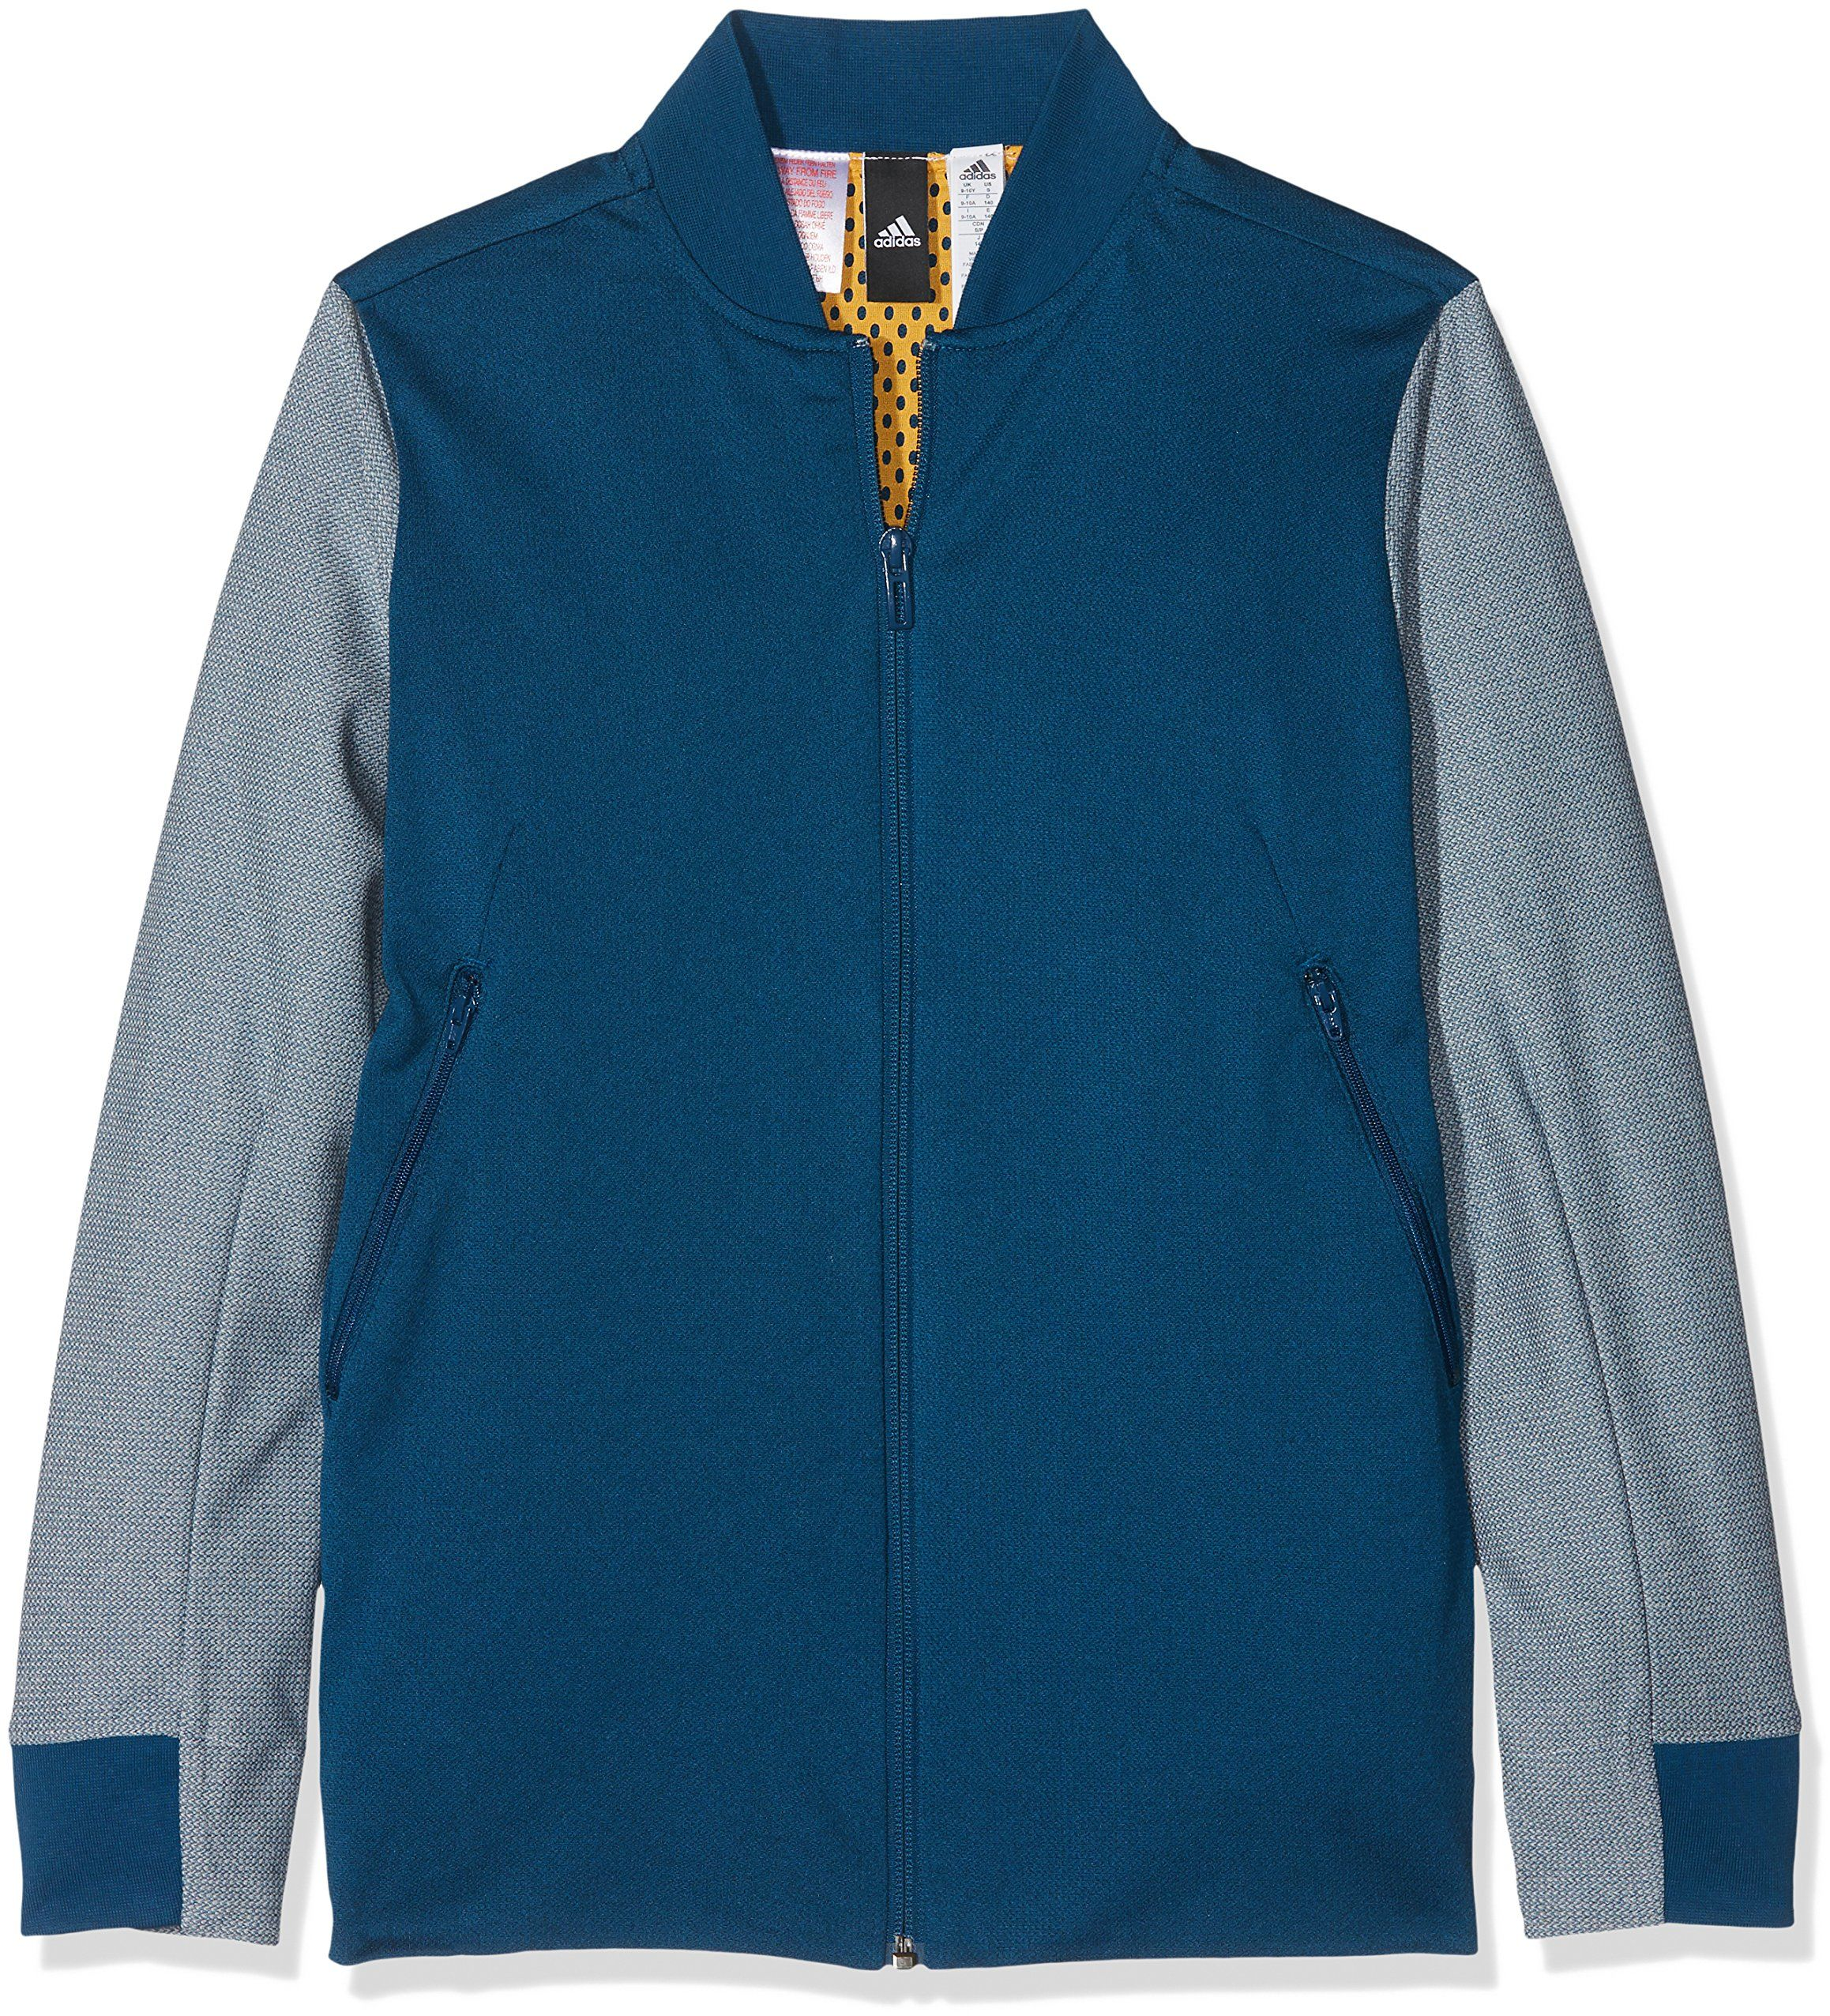 adidas Boys'' Yb ID kurtka bomberka Blue/Azunoc/Gridos Size 152